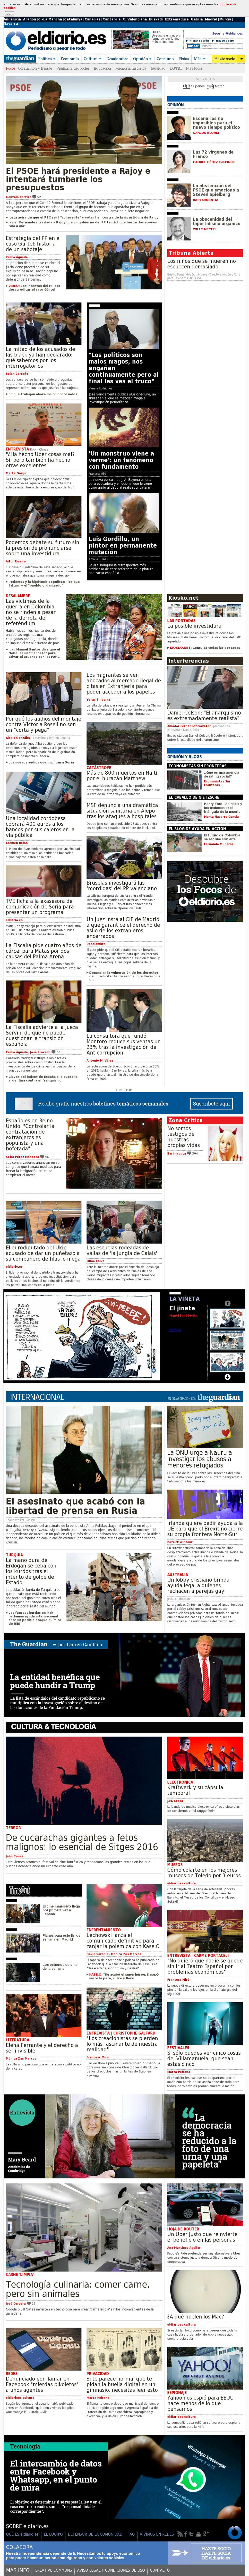 El Diario at Saturday Oct. 8, 2016, 7:05 a.m. UTC